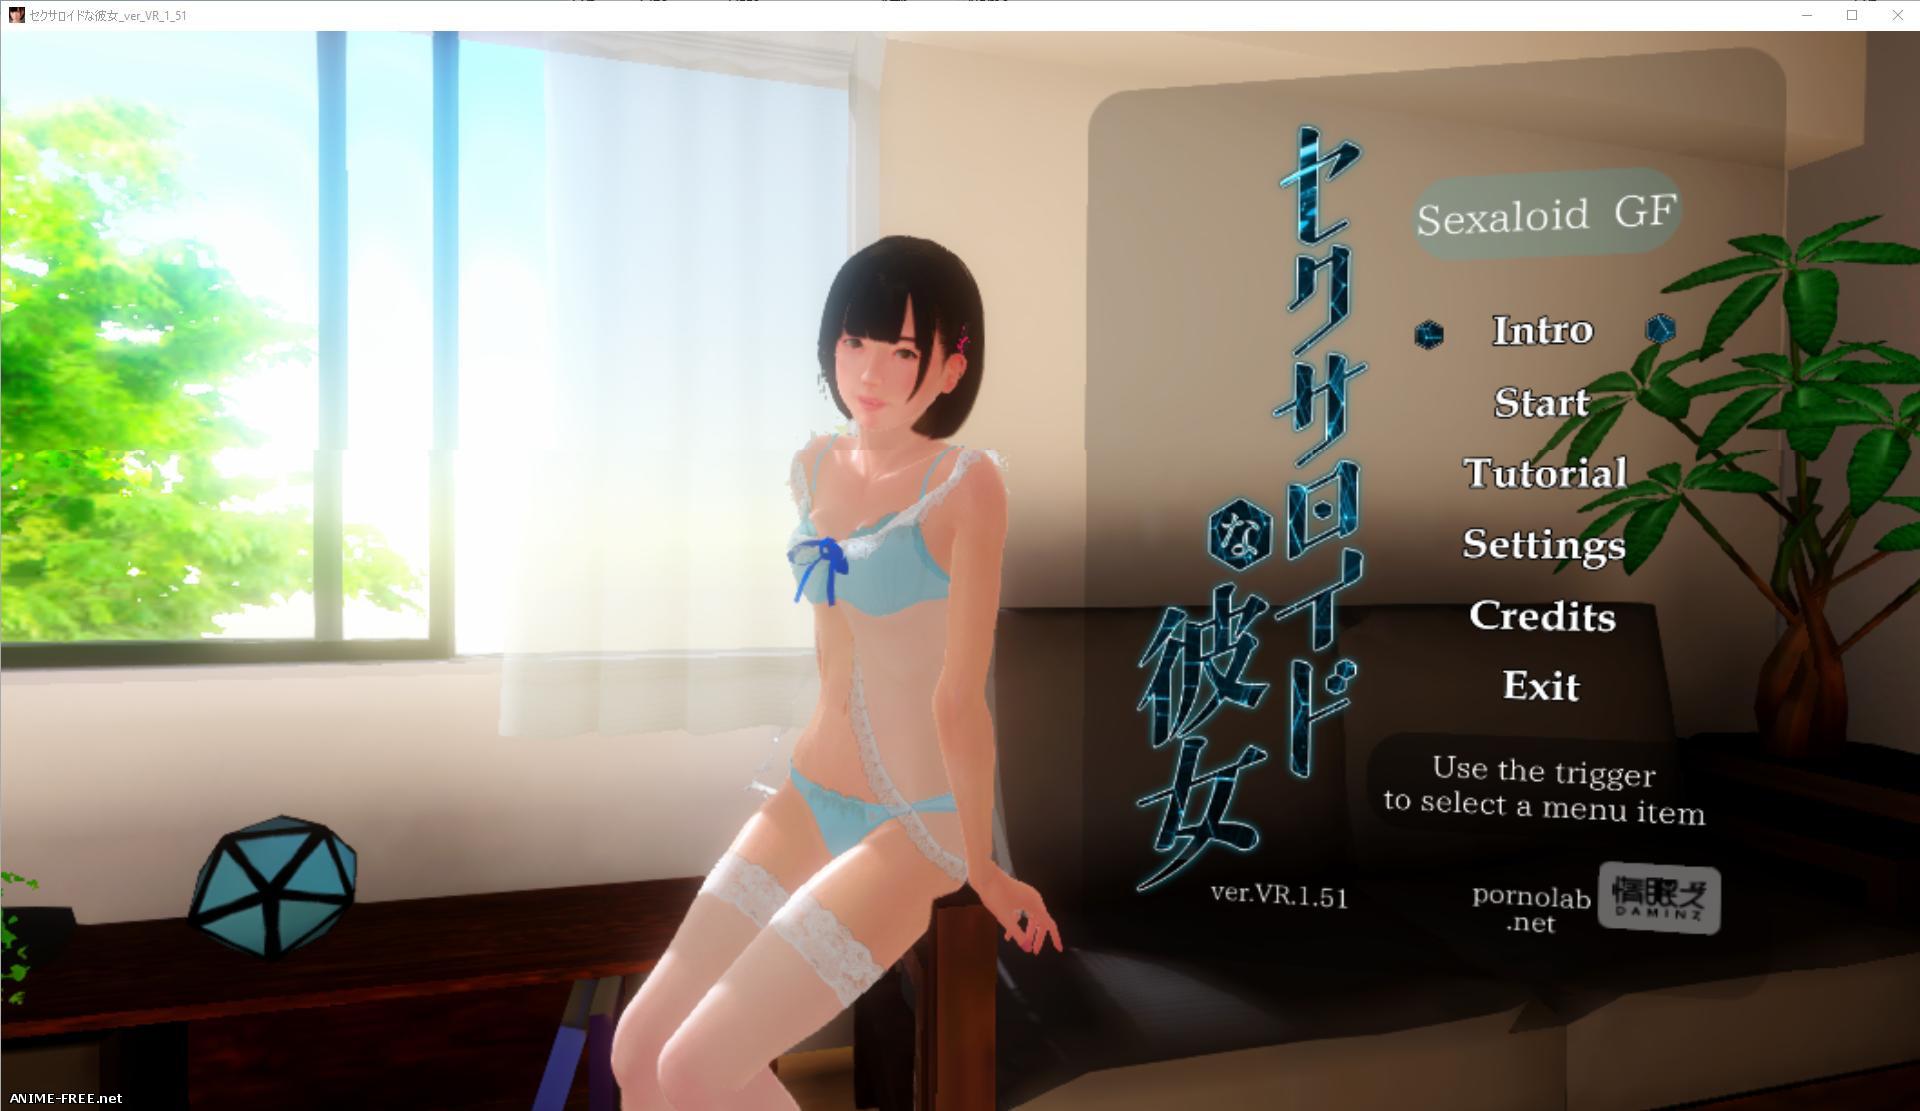 Sexaloid Girlfriend [VR version] / Моя девушка - секс-андроид [VR версия] [2017] [Uncen] [3DVR, SLG] [JAP,ENG] H-Game